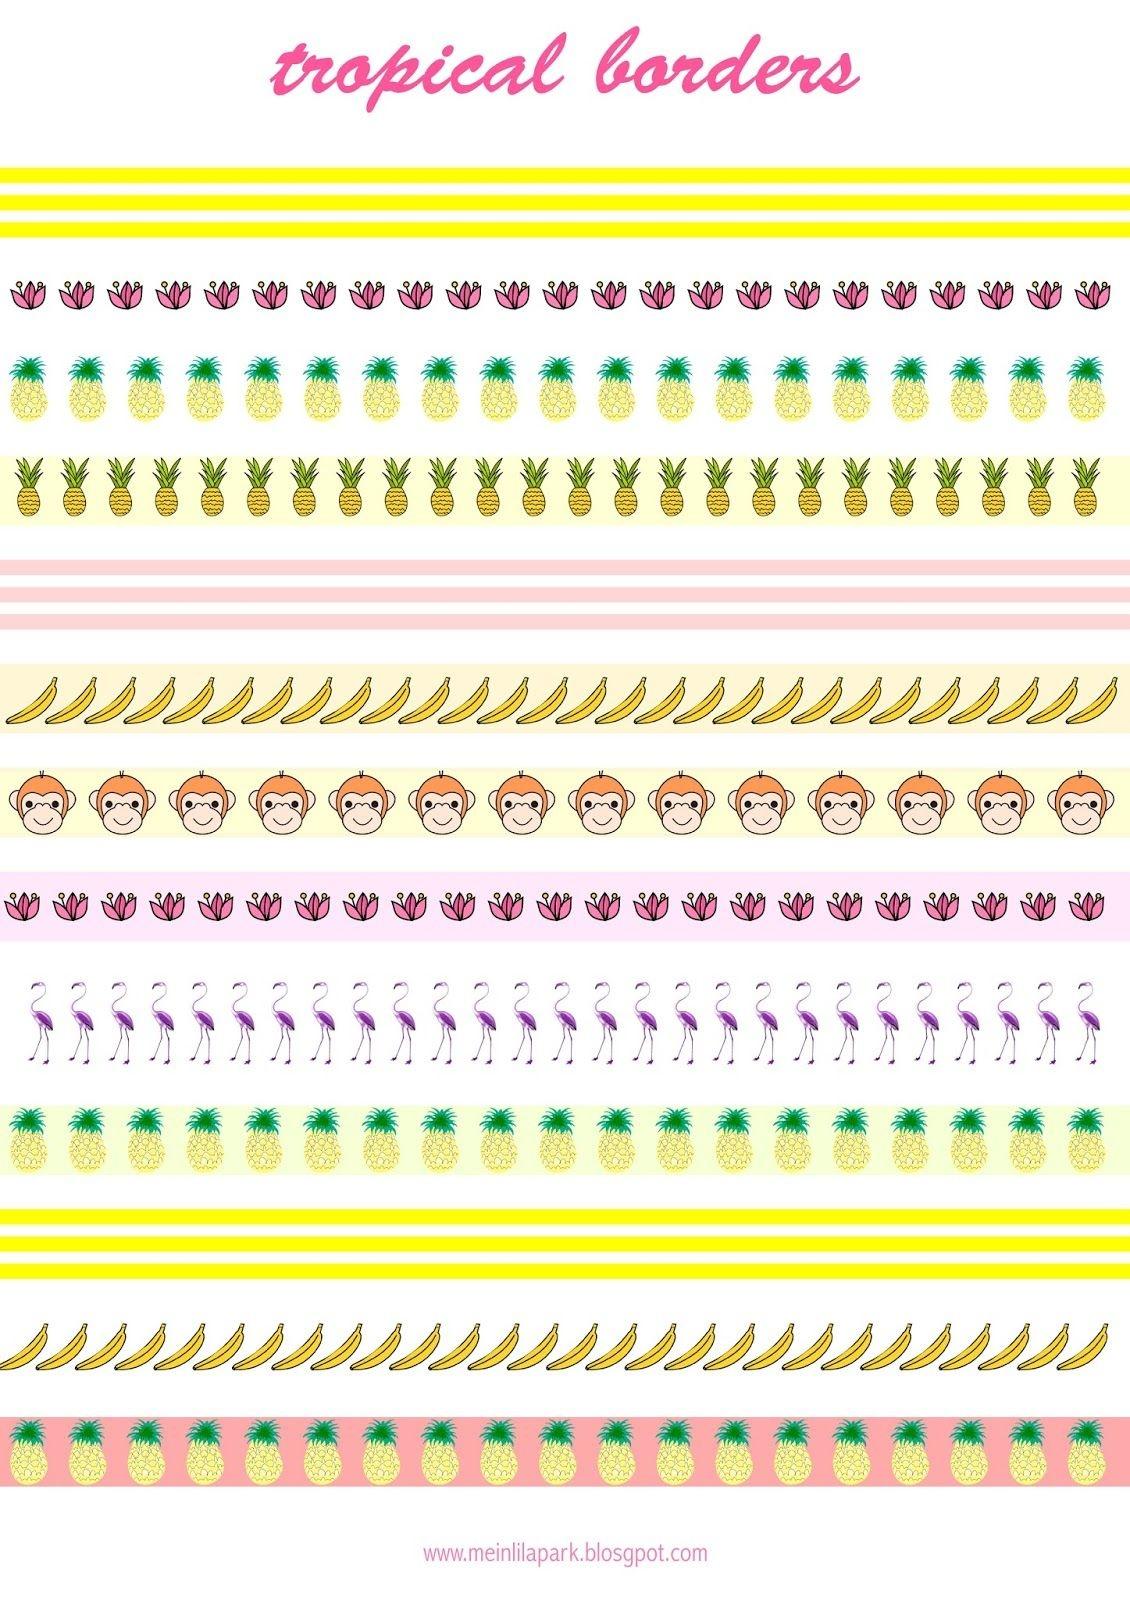 Free Printable Tropical Borders - Planner Stickers - Freebie - Free Printable Borders For Scrapbooking